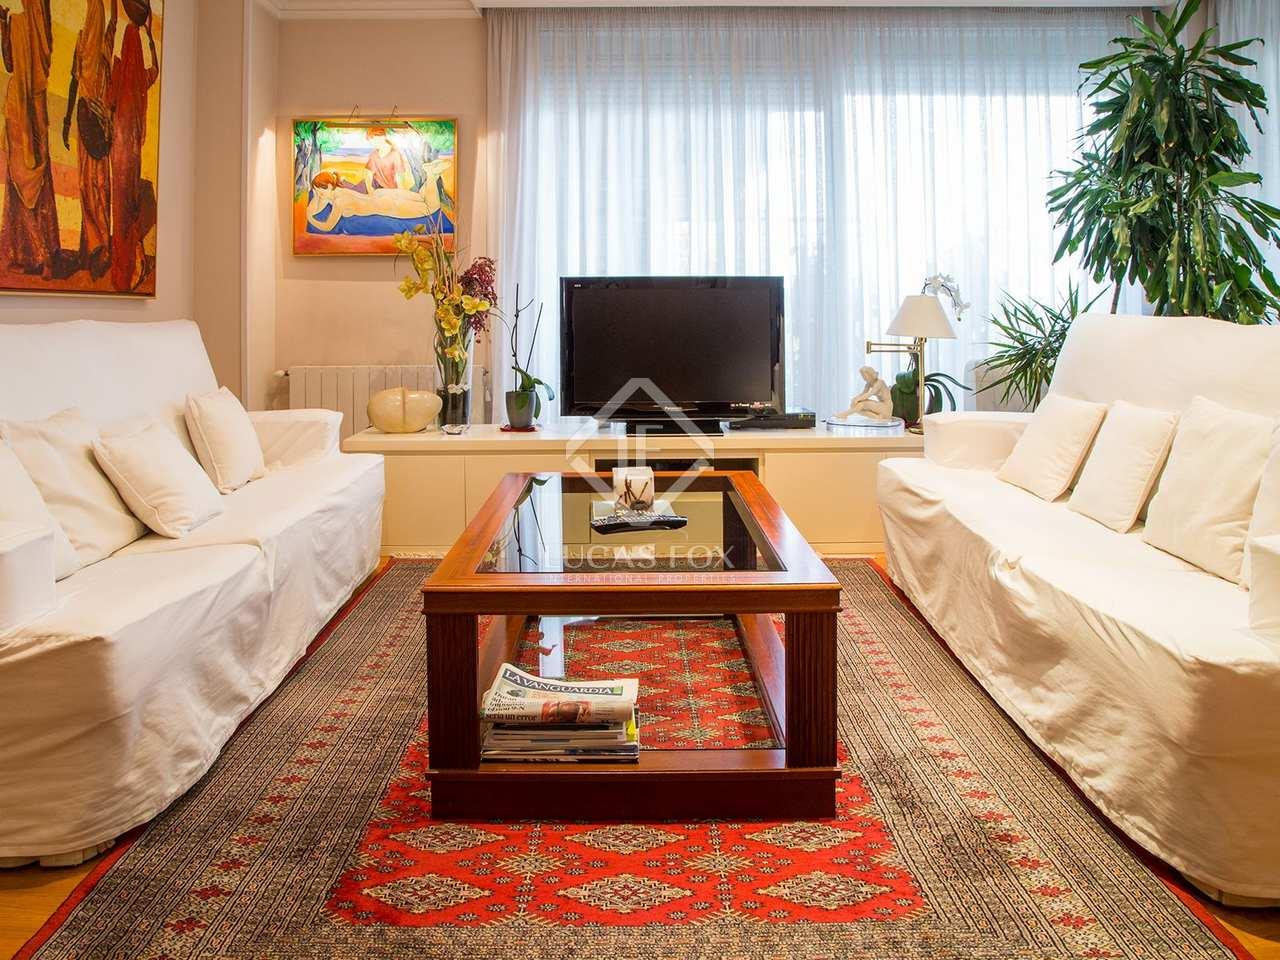 Apartamento con terraza en venta en tres torres barcelona - Precio toldos terraza barcelona ...